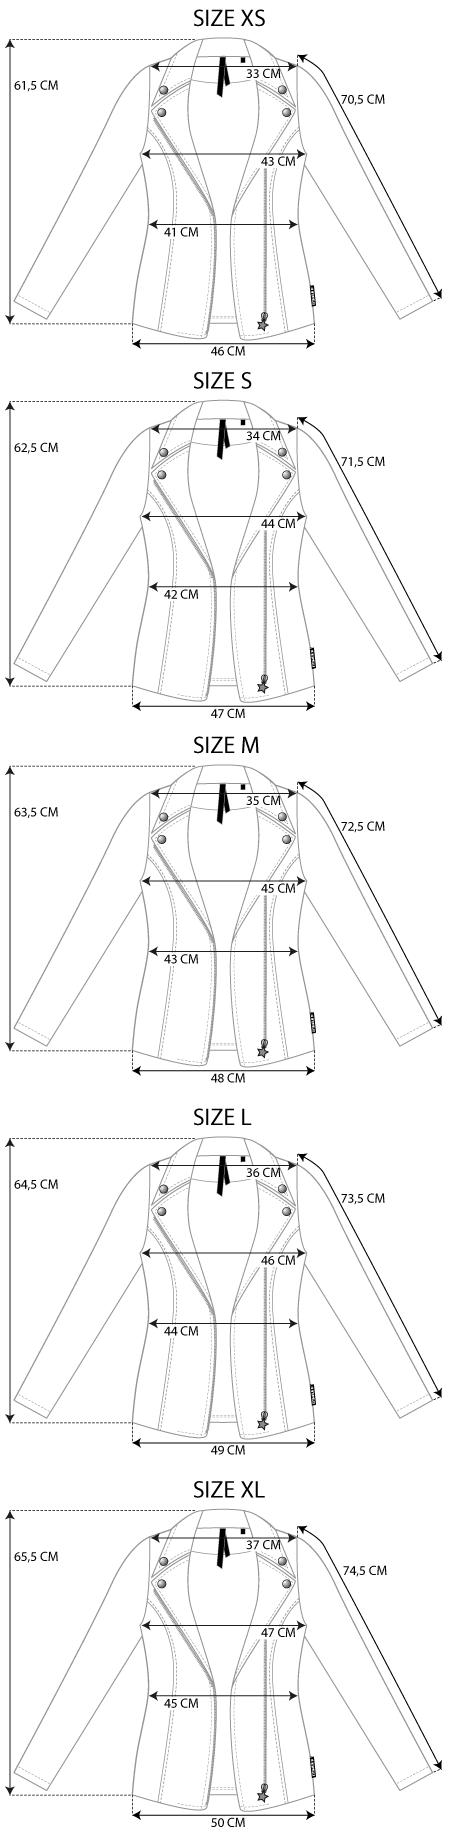 Maattabel leather jacket